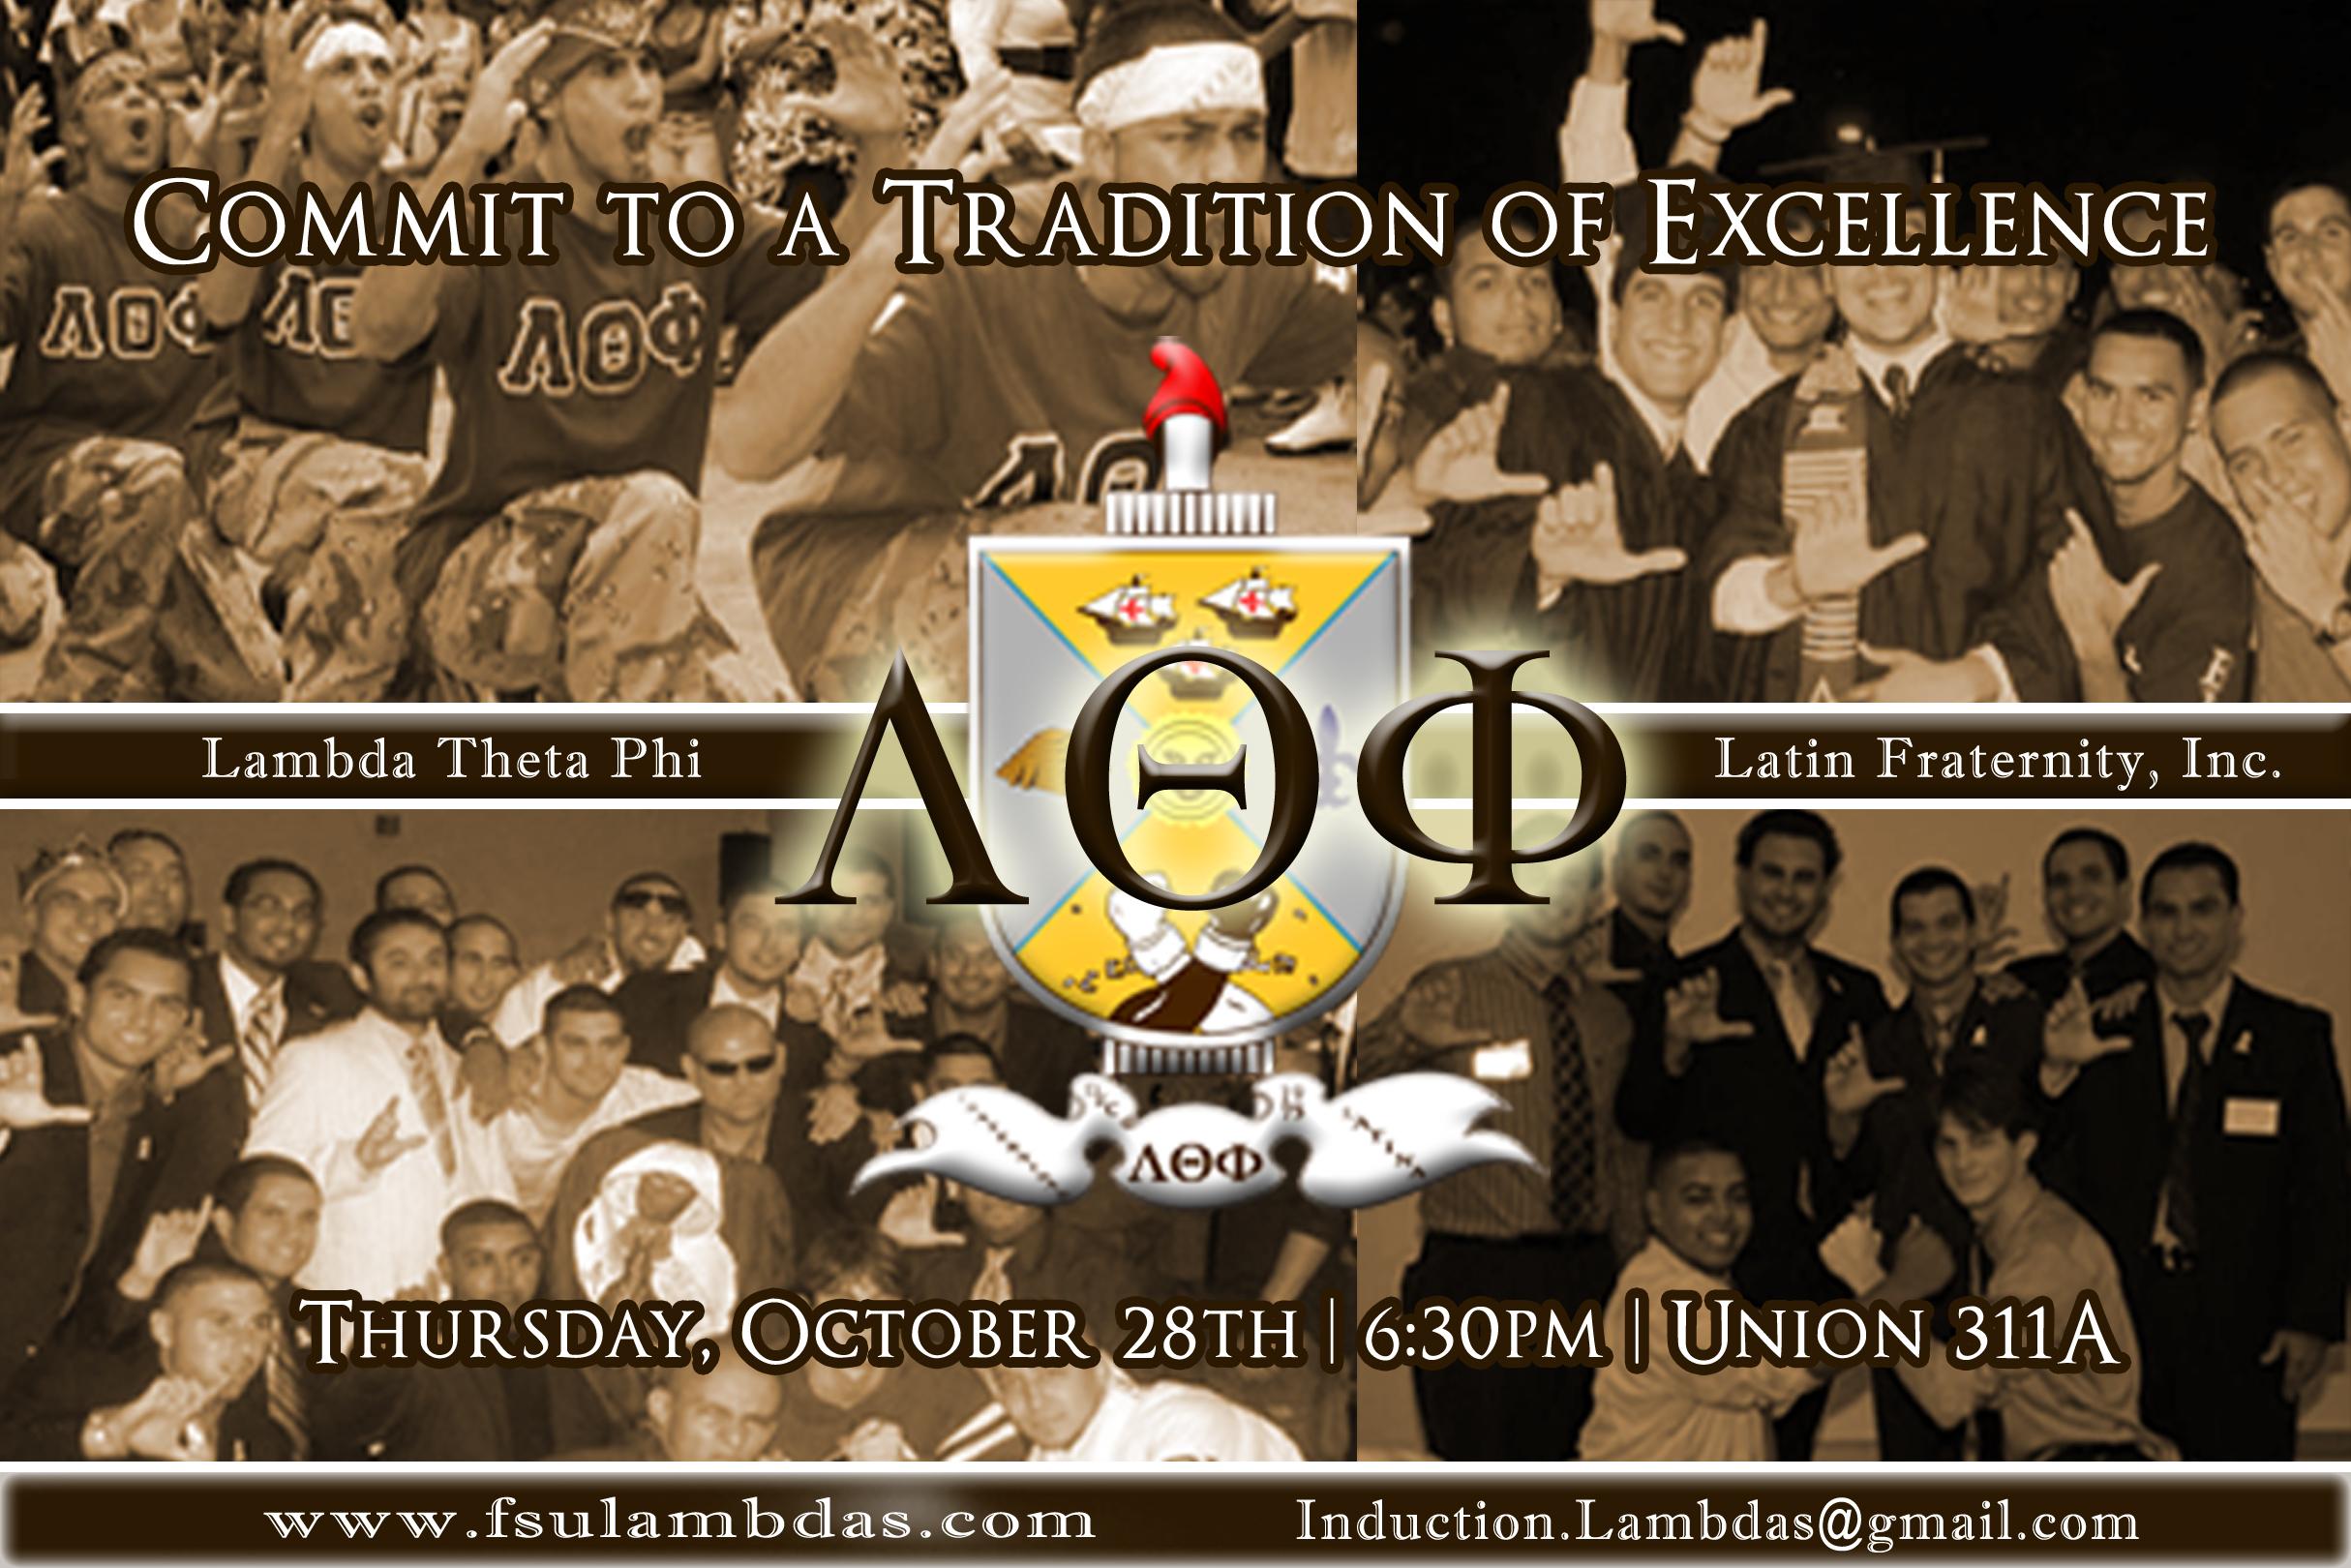 Latin Fraternity 62